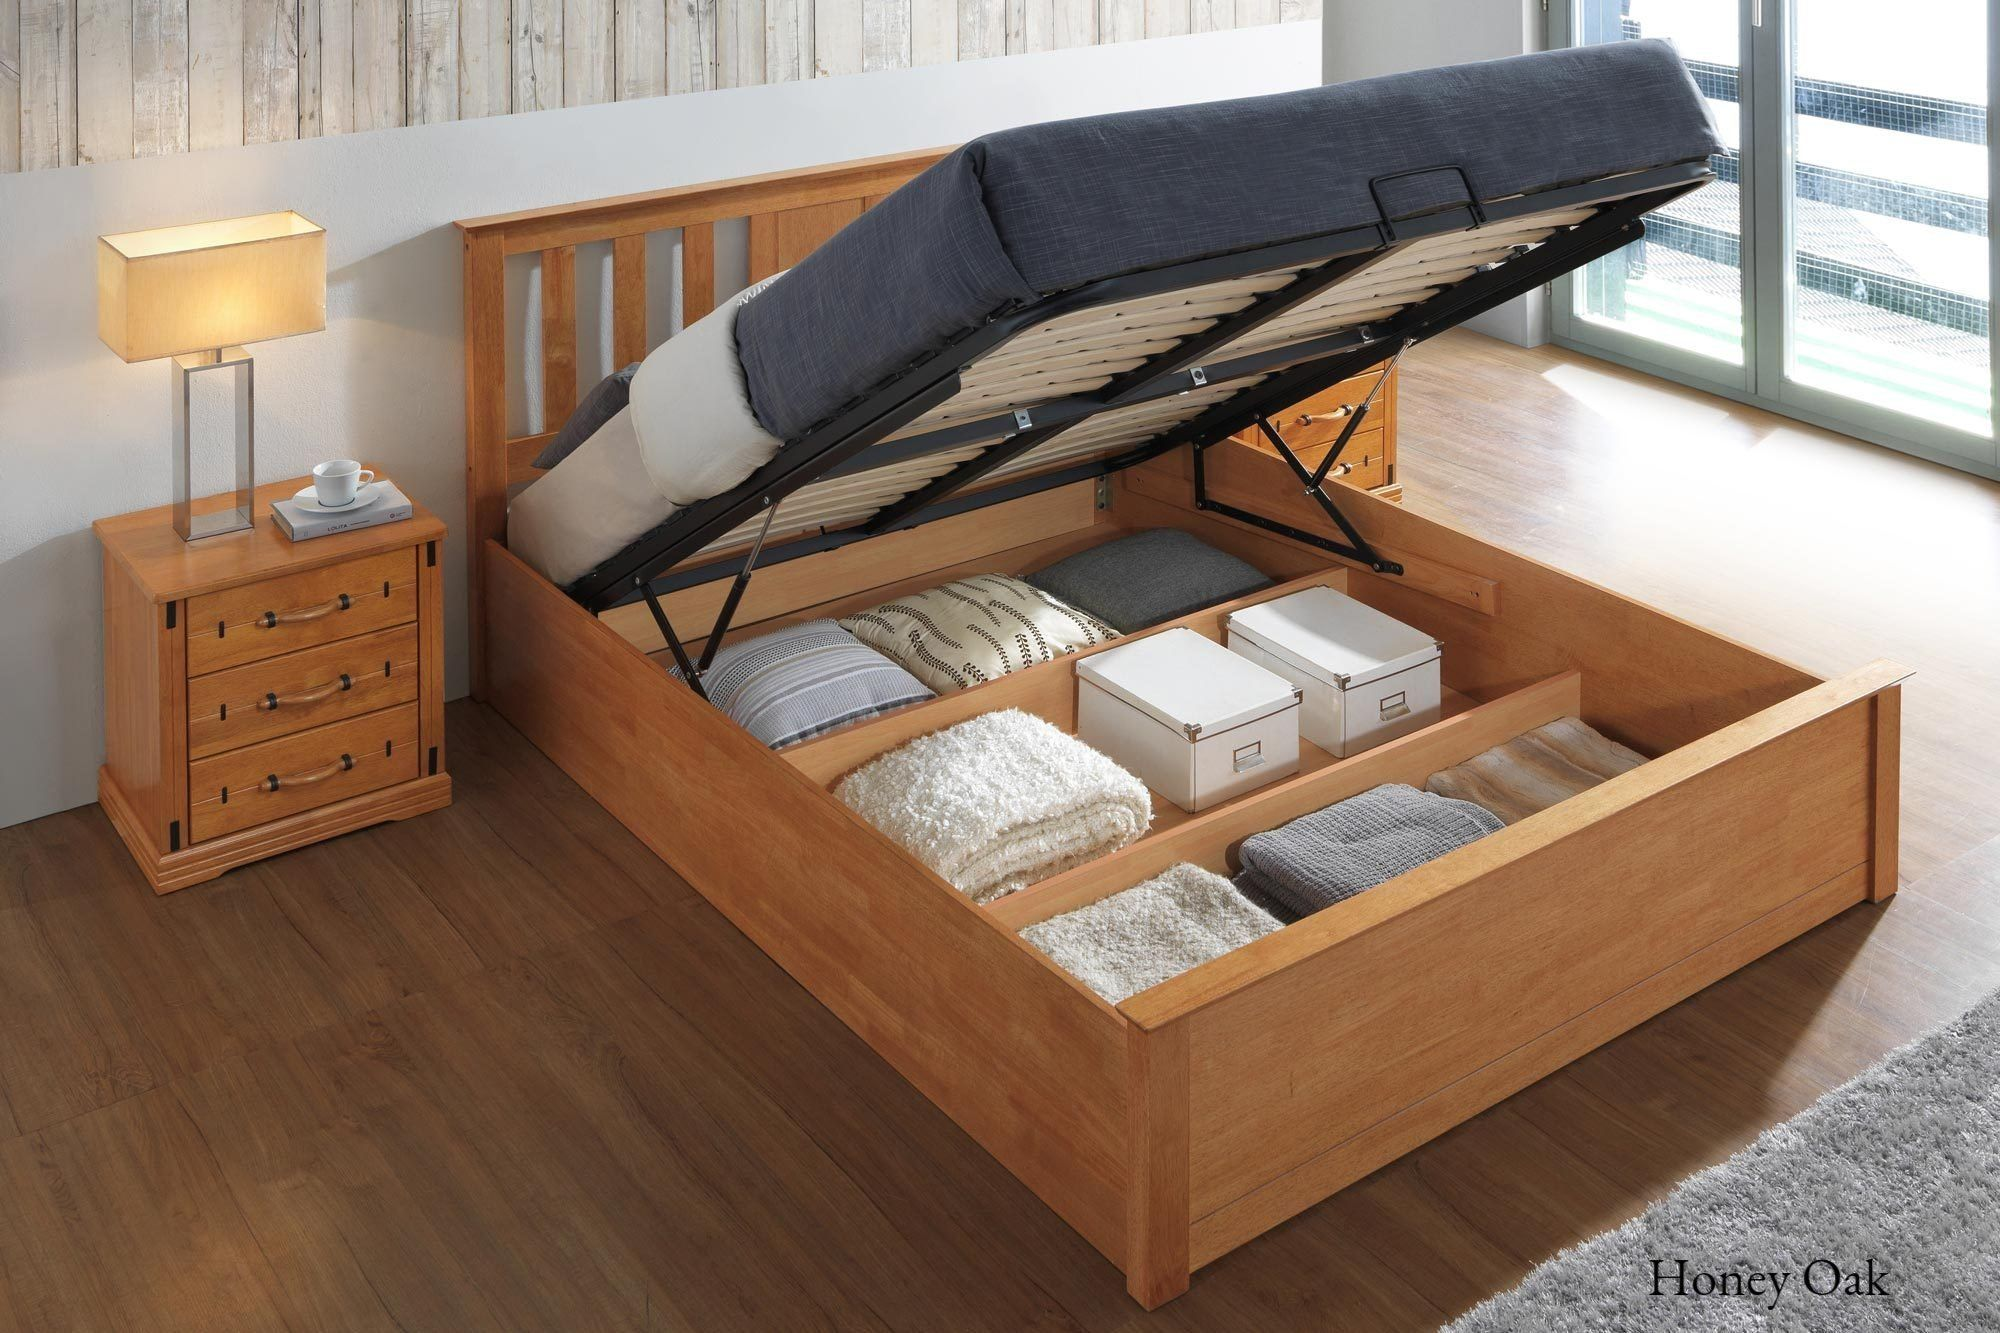 Outstanding Chester Honey Oak Ottoman Storage Bed Frame 5Ft King Size Dailytribune Chair Design For Home Dailytribuneorg